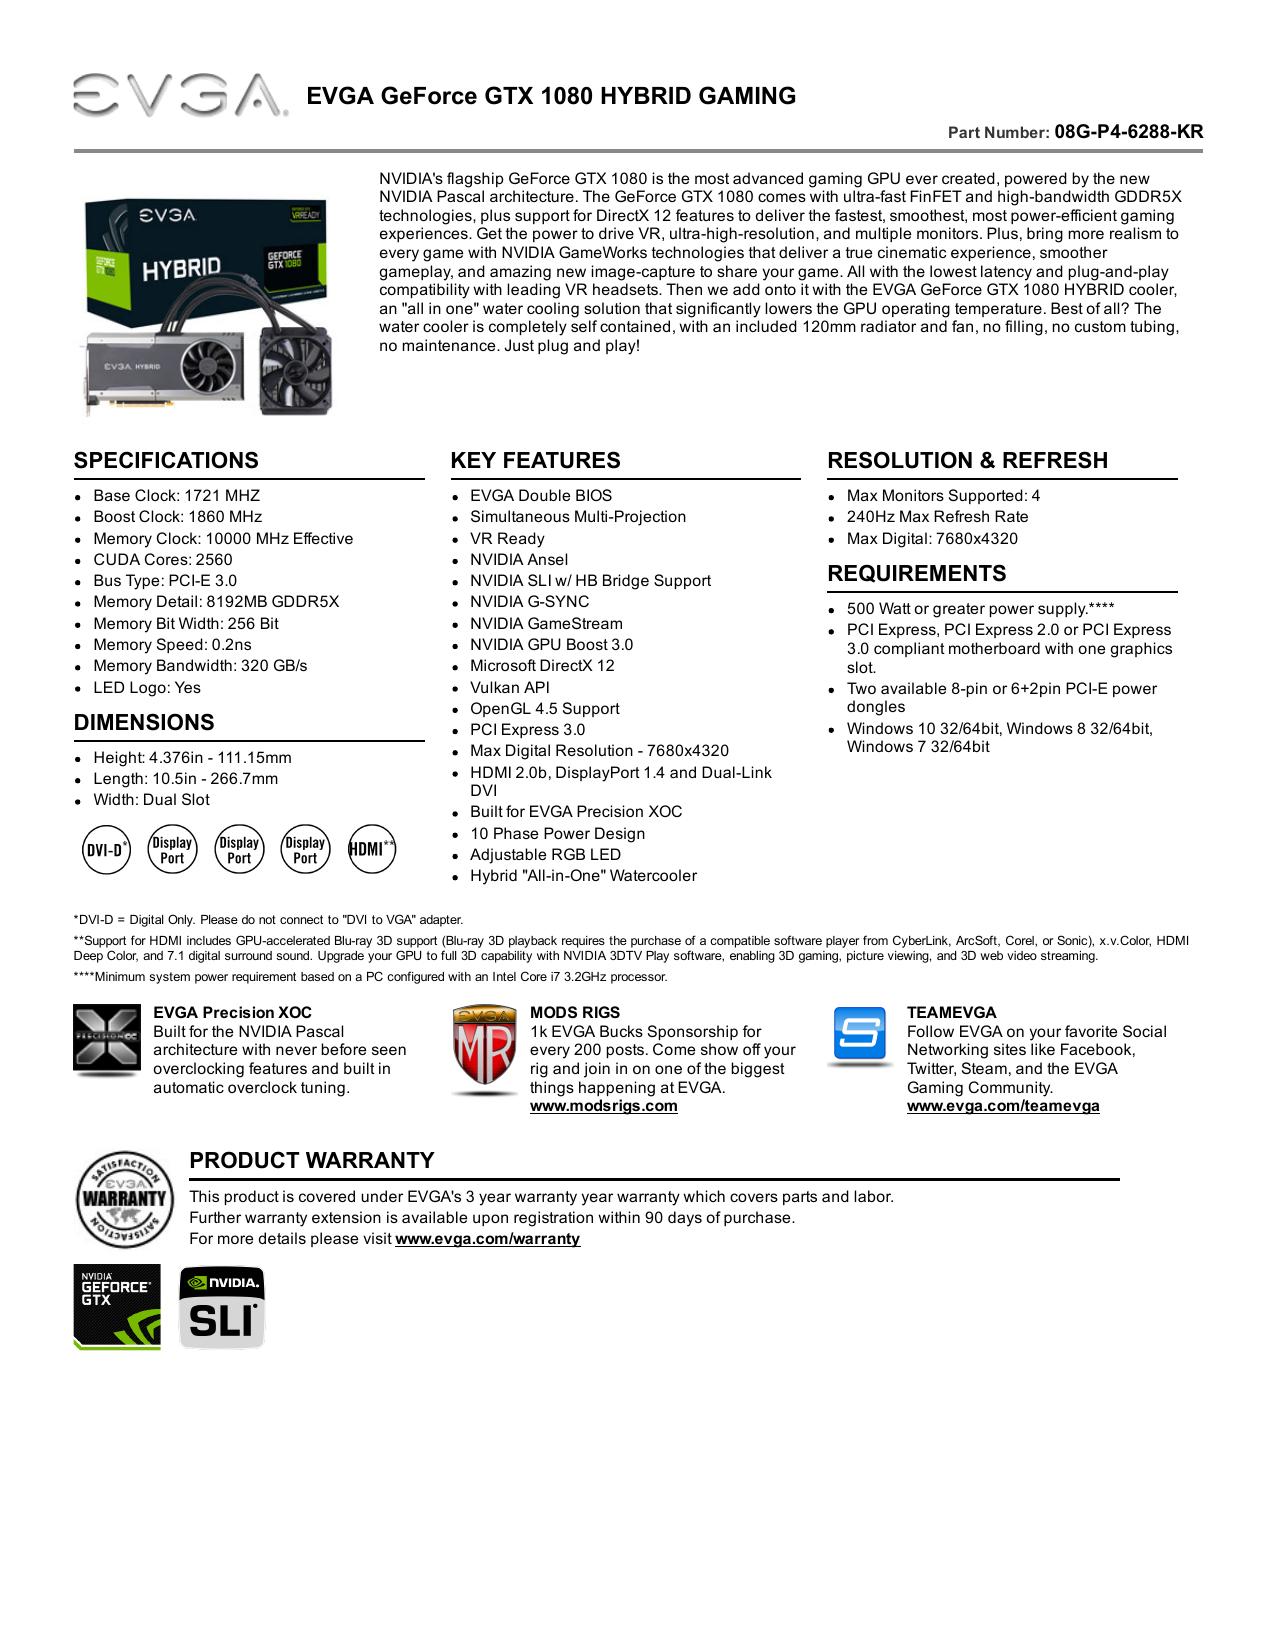 EVGA GeForce GTX 1080 HYBRID GAMING | manualzz com